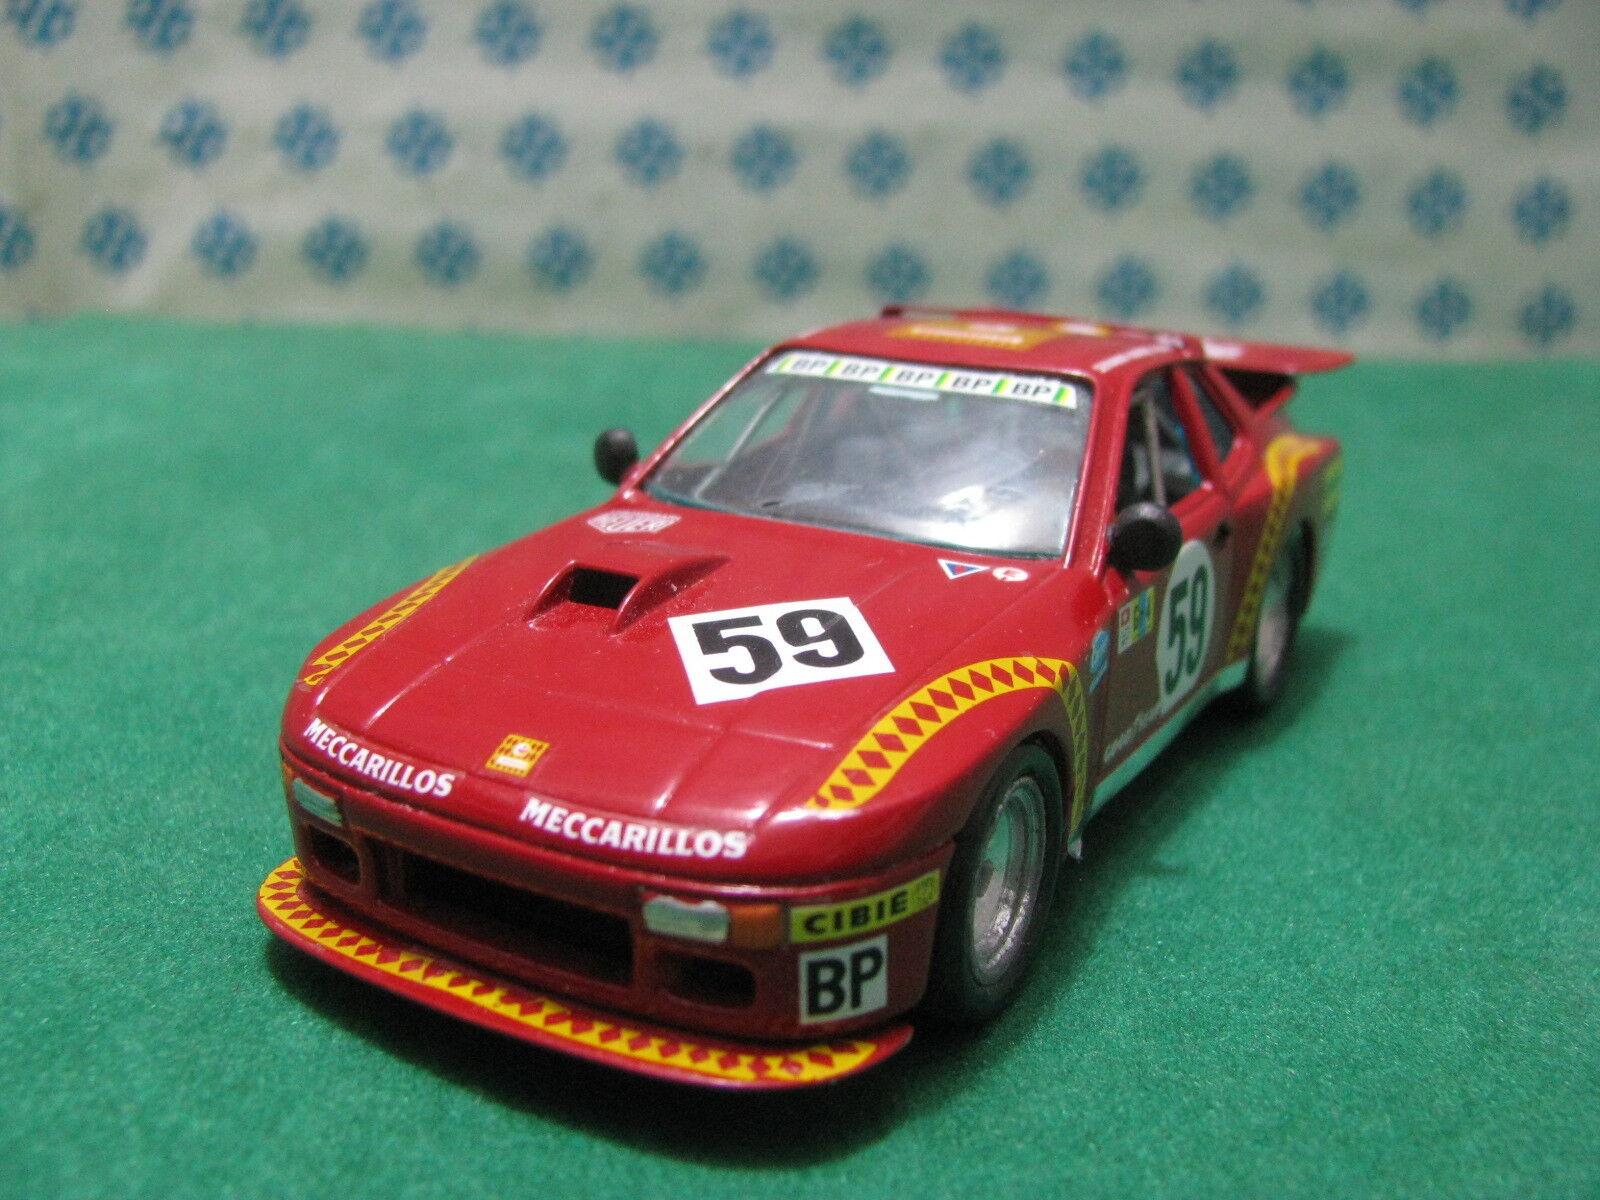 Porsche 924 Turbo Scuderia Mecarillos - 1 43 Traitement Kit Artisanat